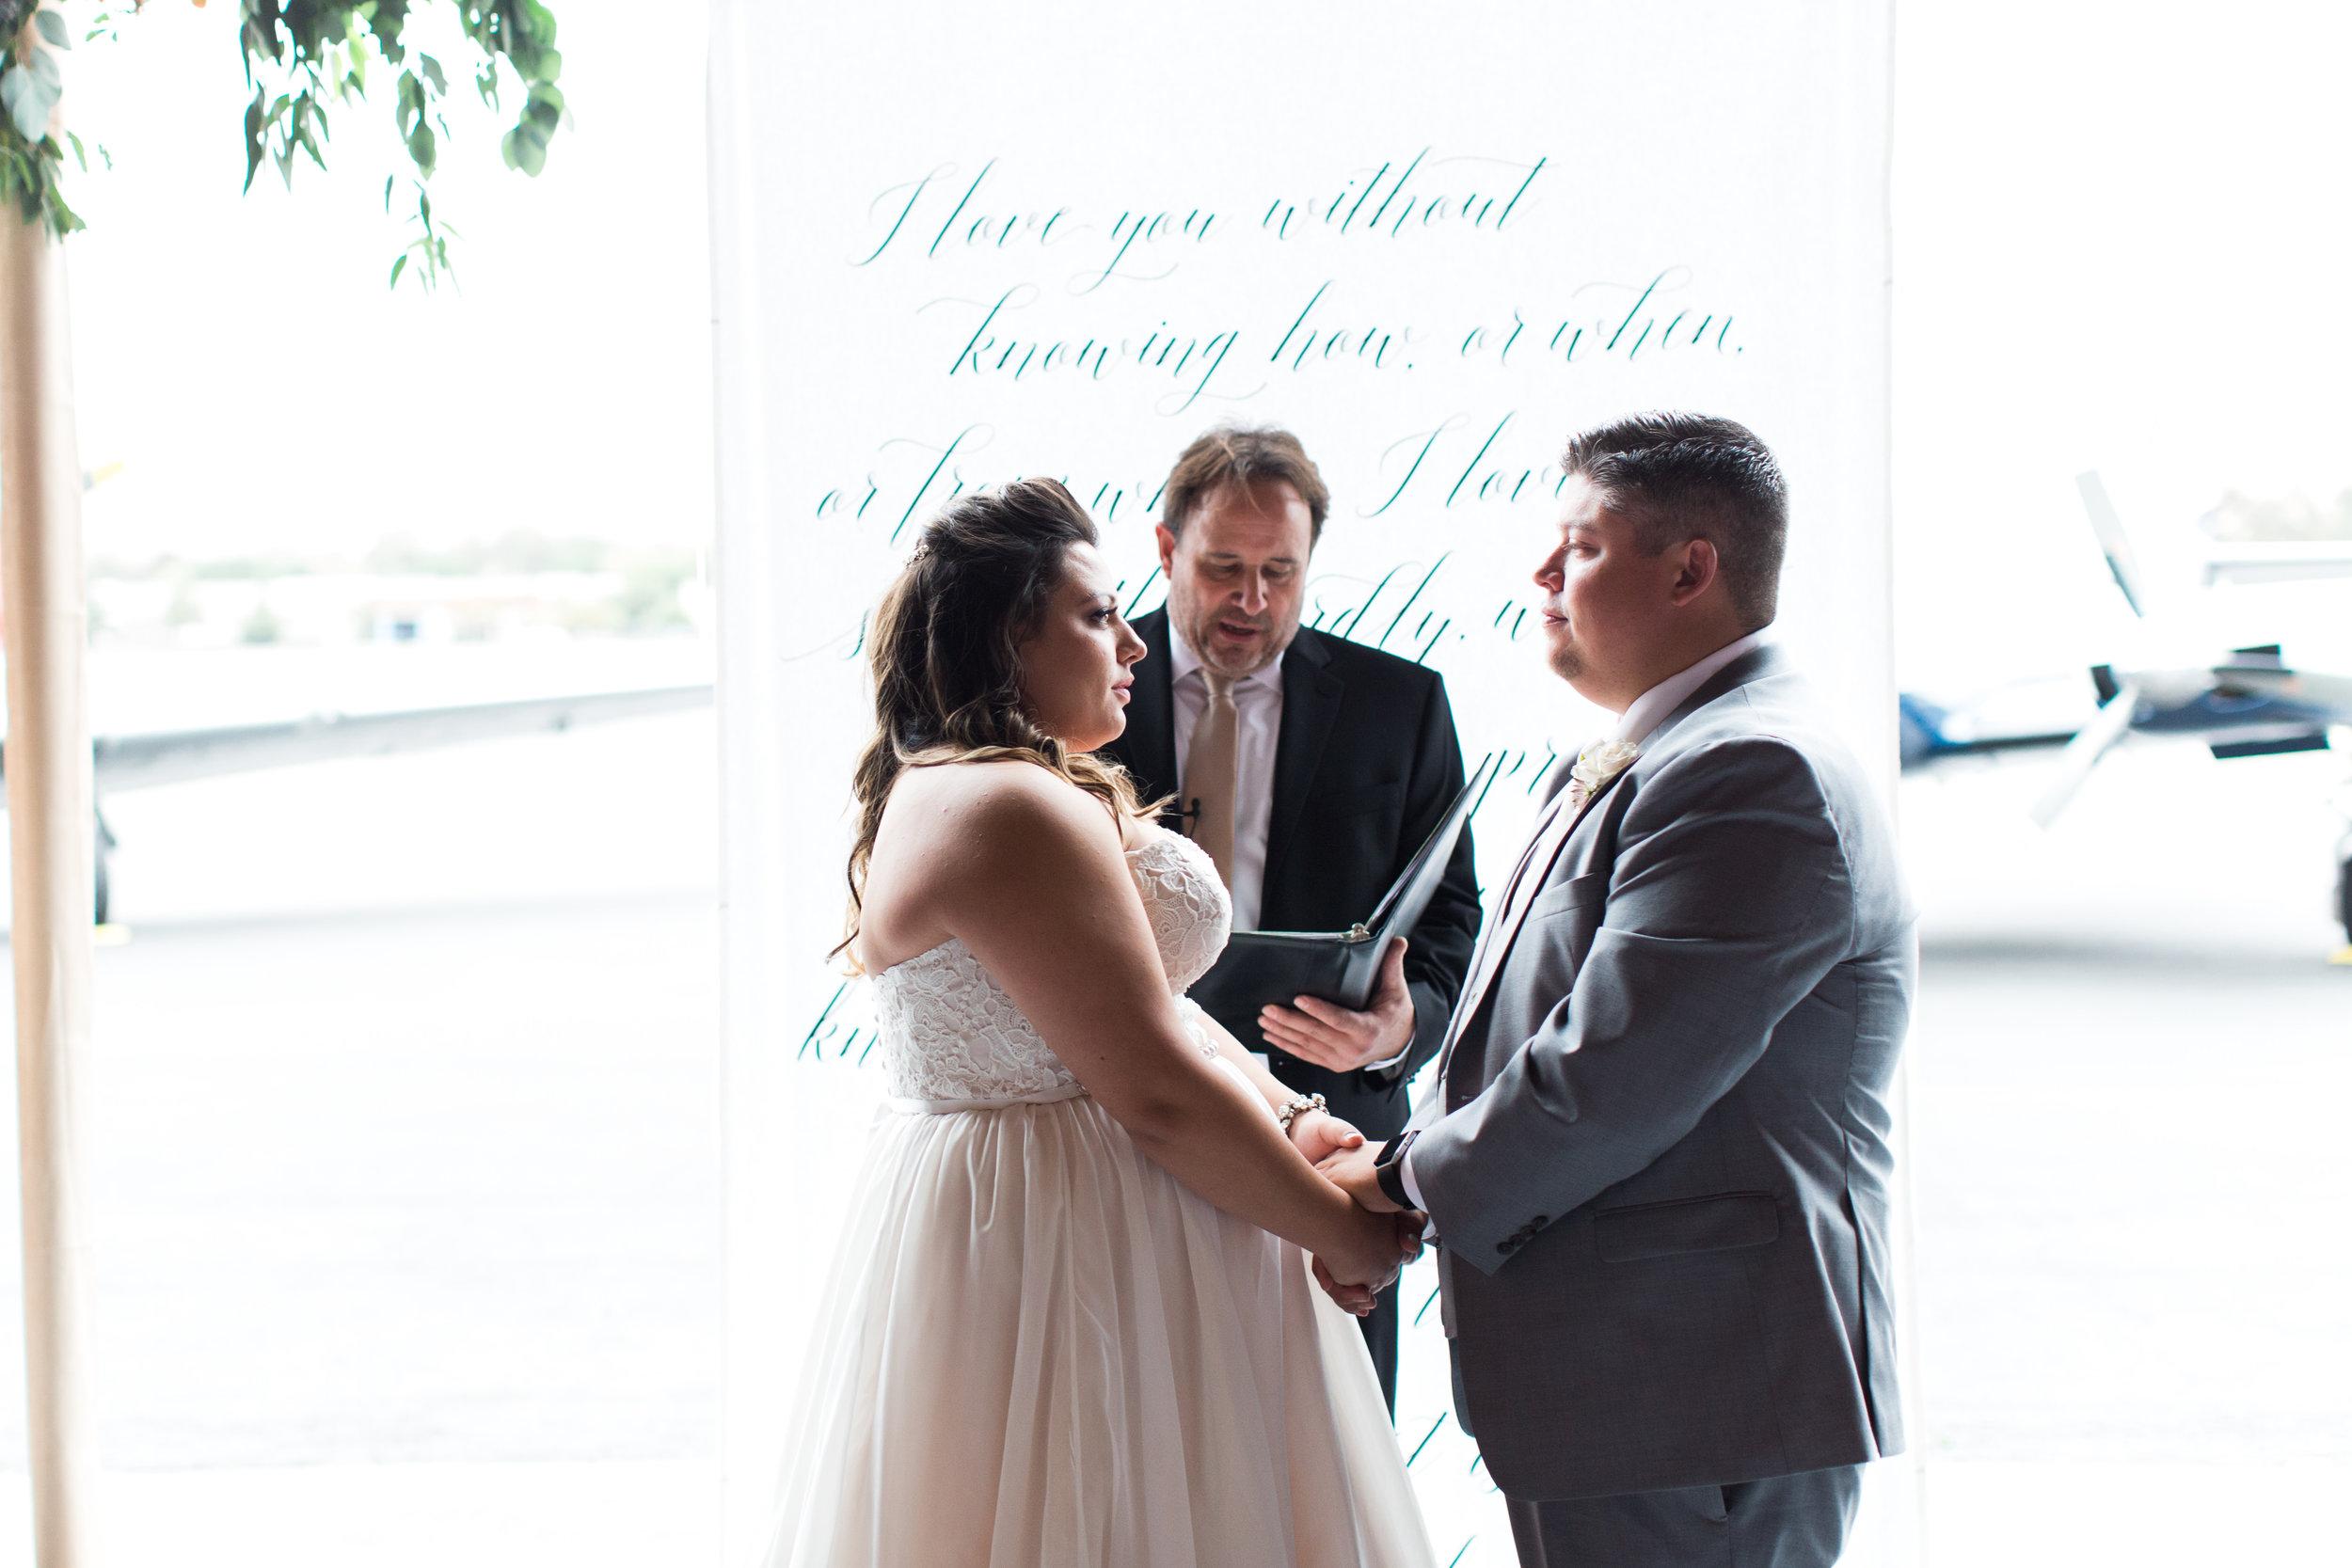 airport-hanger-wedding-at-attitude-aviation-in-livermore-58.jpg